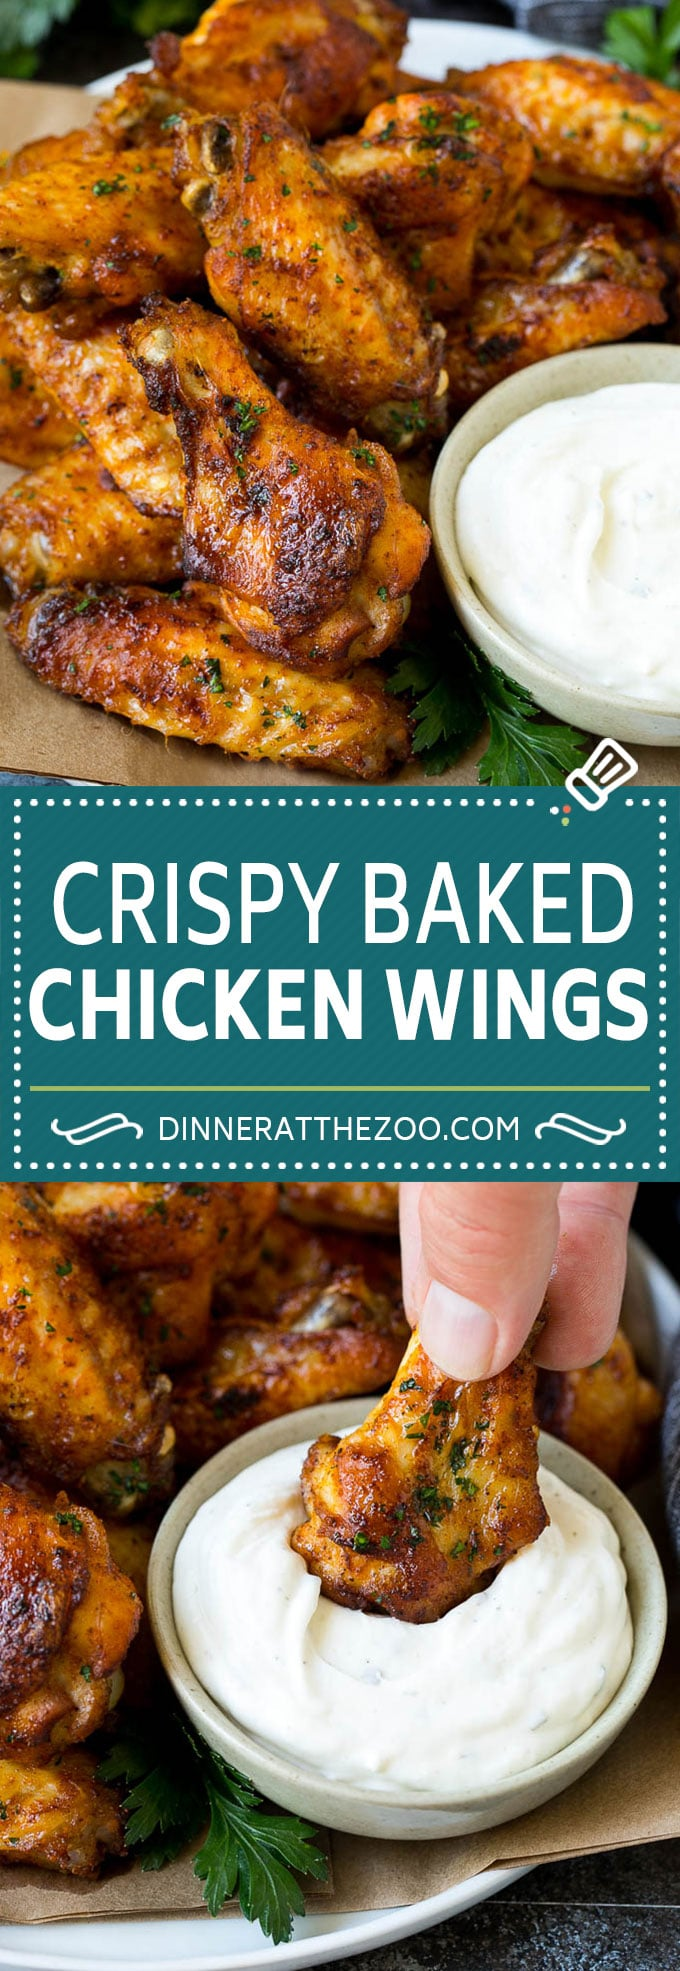 Baked Chicken Wings Recipe   Roasted Chicken Wings #chicken #chickenwings #appetizer #snack #dinner #dinneratthezoo